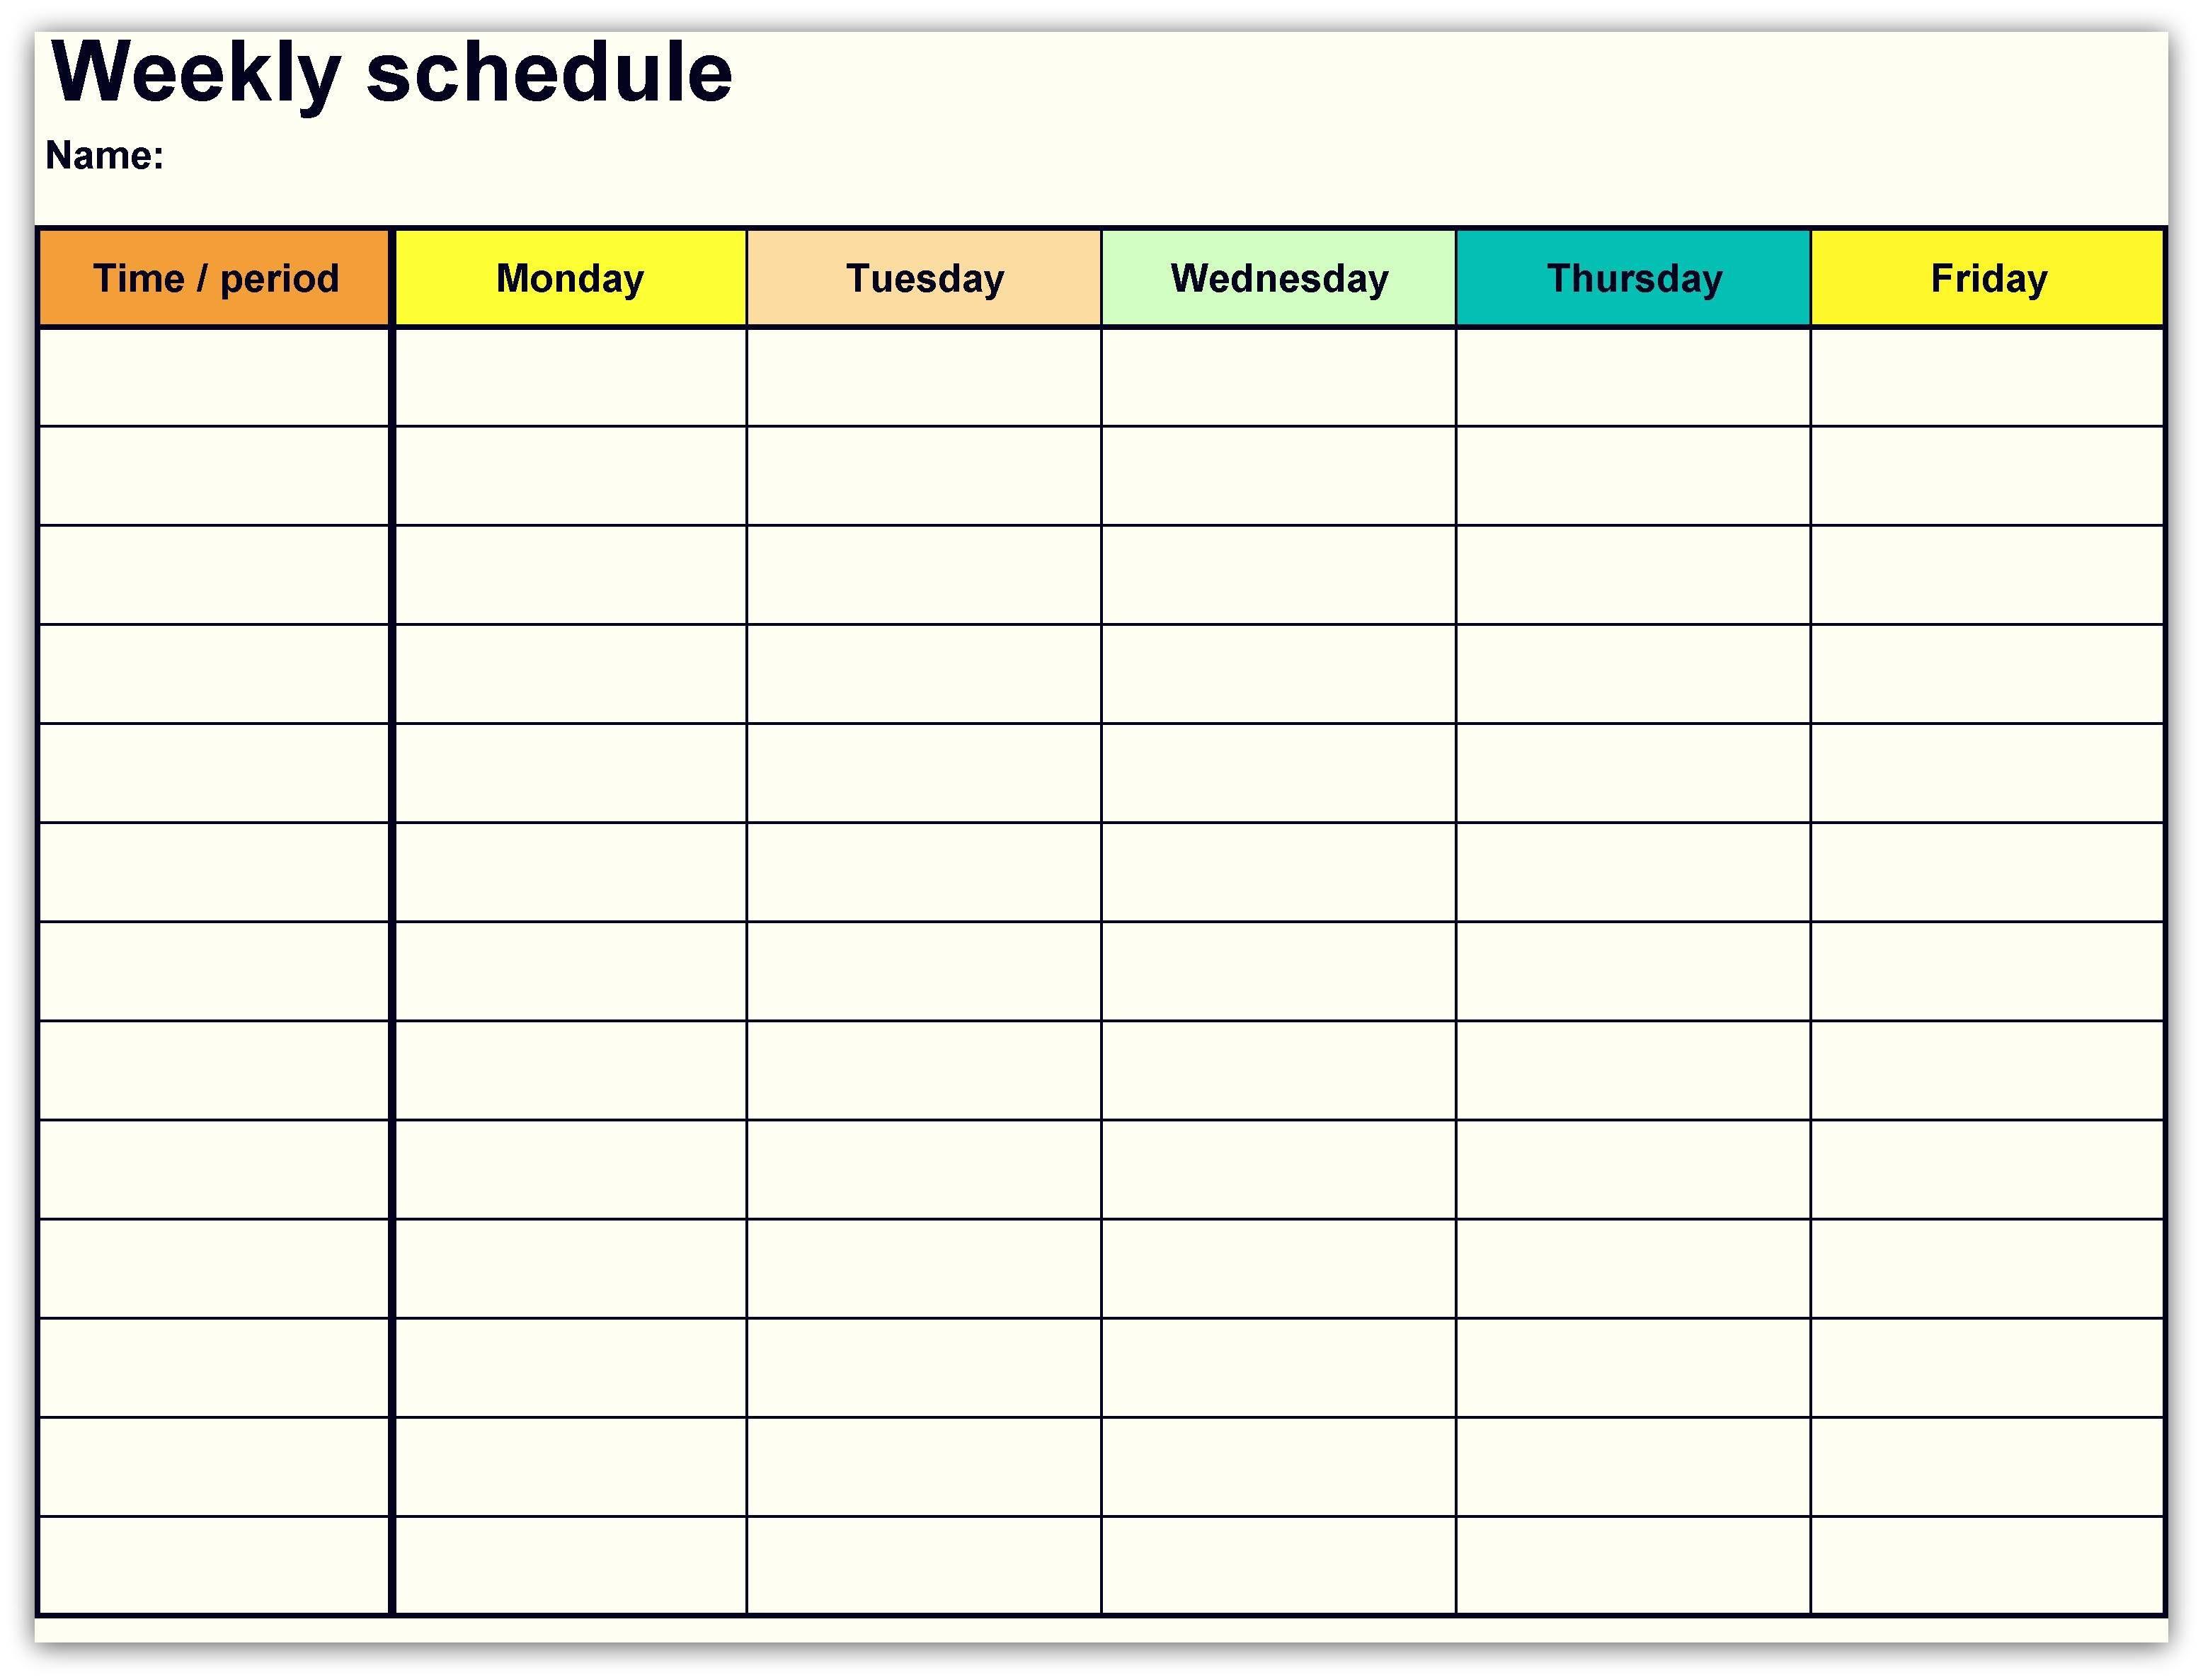 2019 Excel Calendar with Singapore Holidays Más Actual 2018 Weekly Planner Calendar 2018 Calendars Pinterest Of 2019 Excel Calendar with Singapore Holidays Más Recientes 2019 Calendar Generator